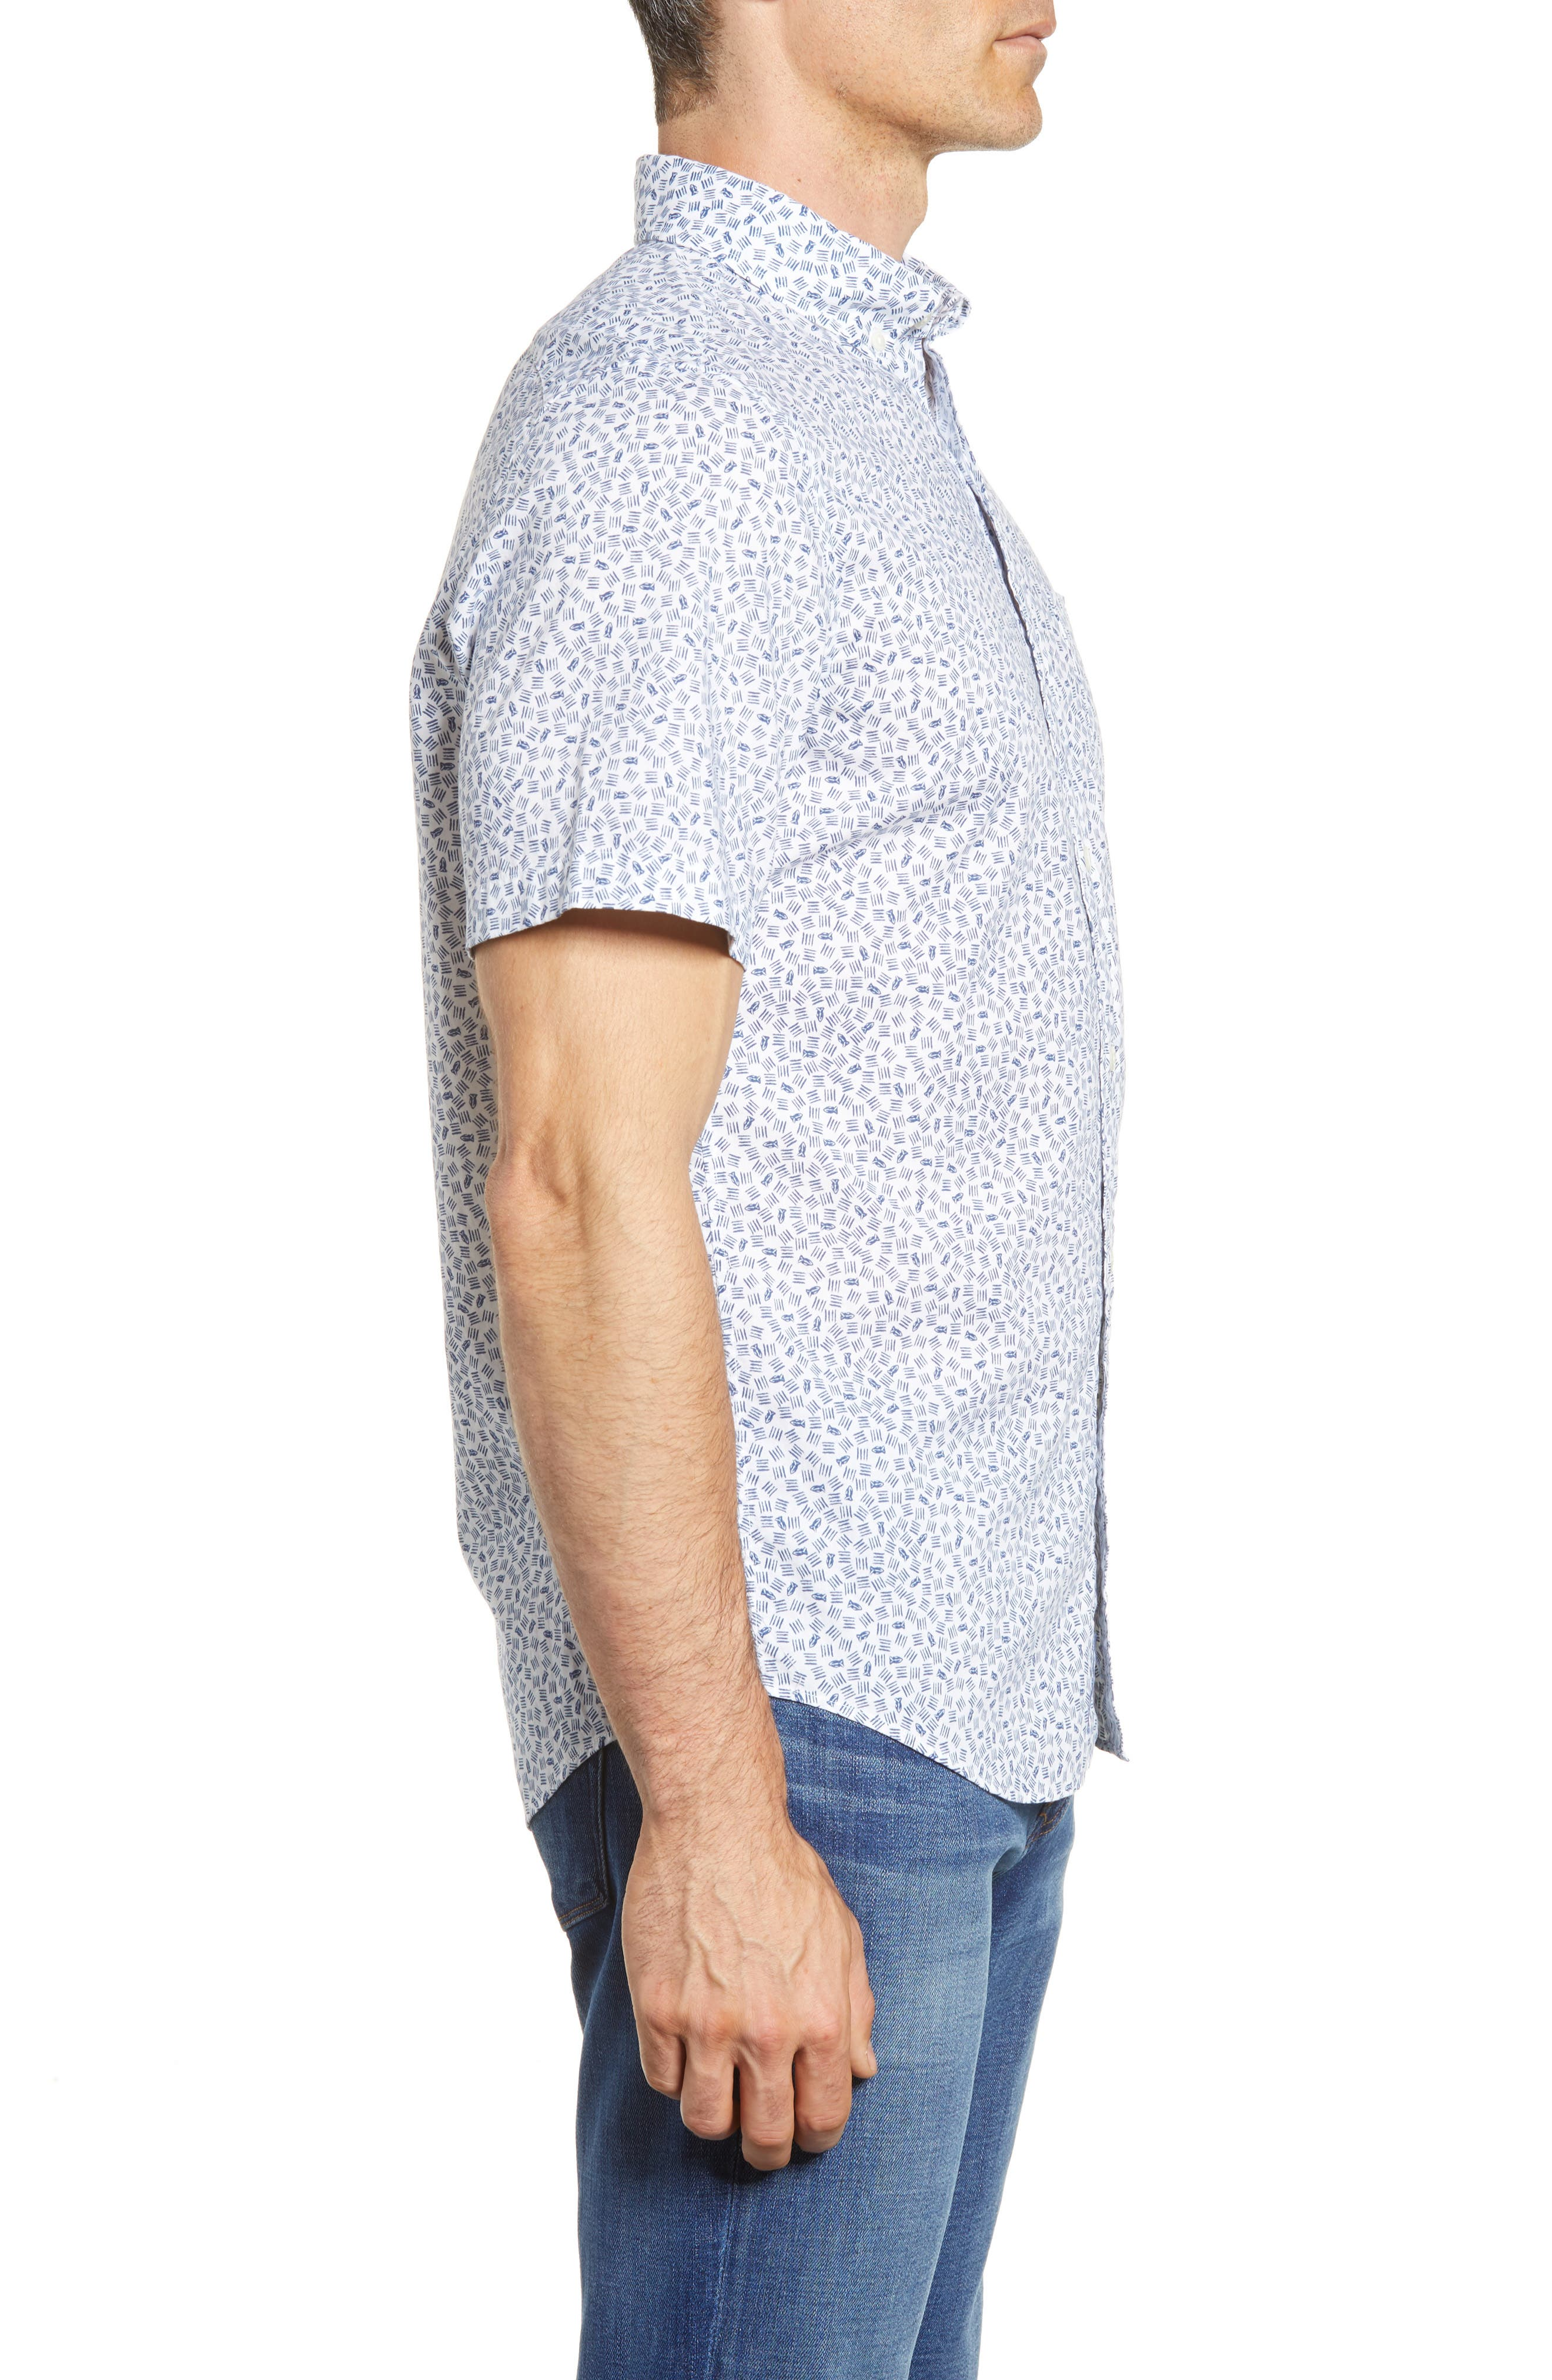 VINEYARD VINES,                             Fish Dash Tucker Slim Fit Sport Shirt,                             Alternate thumbnail 3, color,                             100